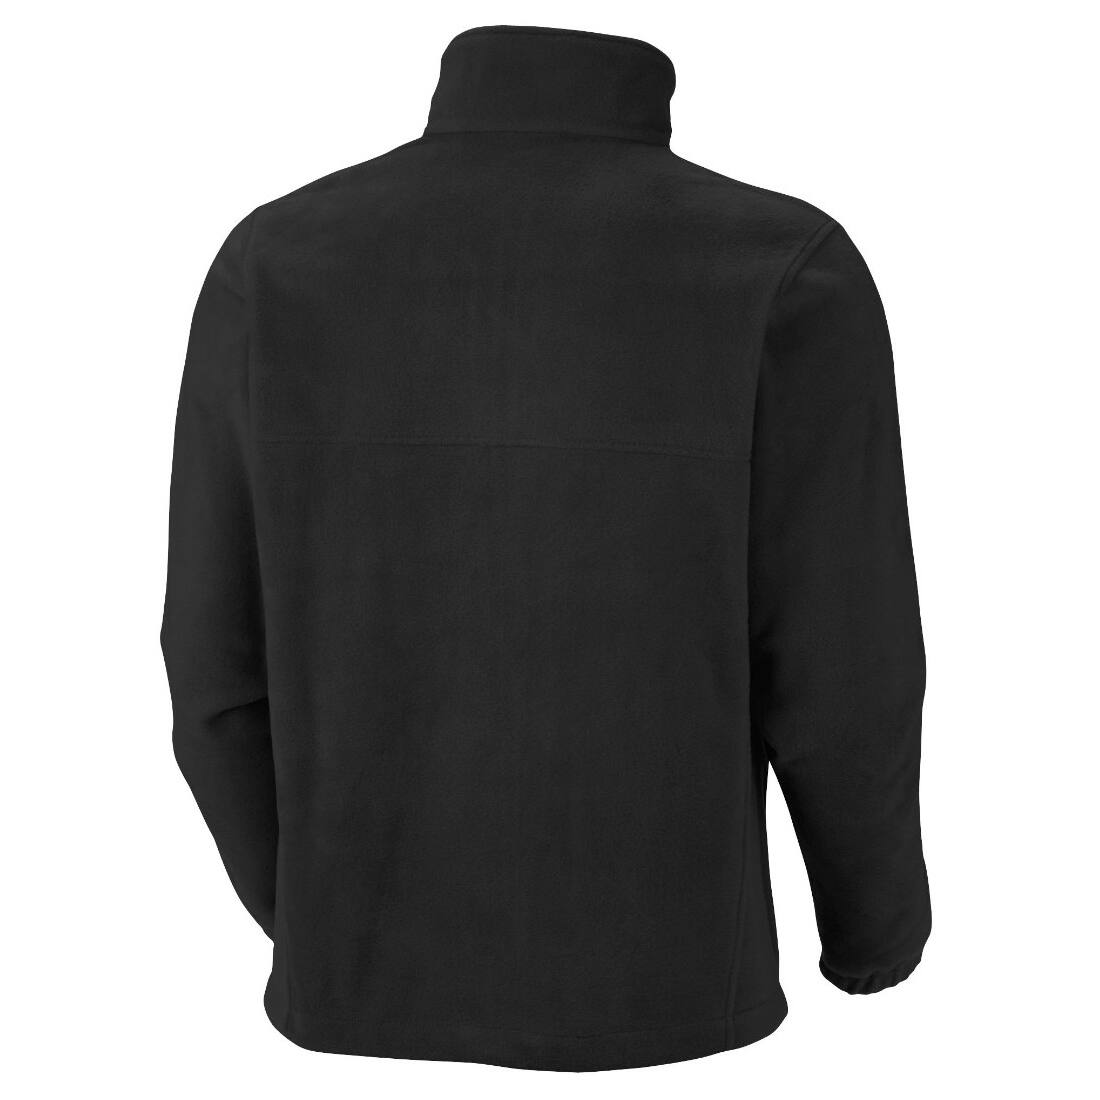 Columbia NEW Mens Original Warm Winter Fleece-Zip-Up-Jacket  $30 + Free Shipping